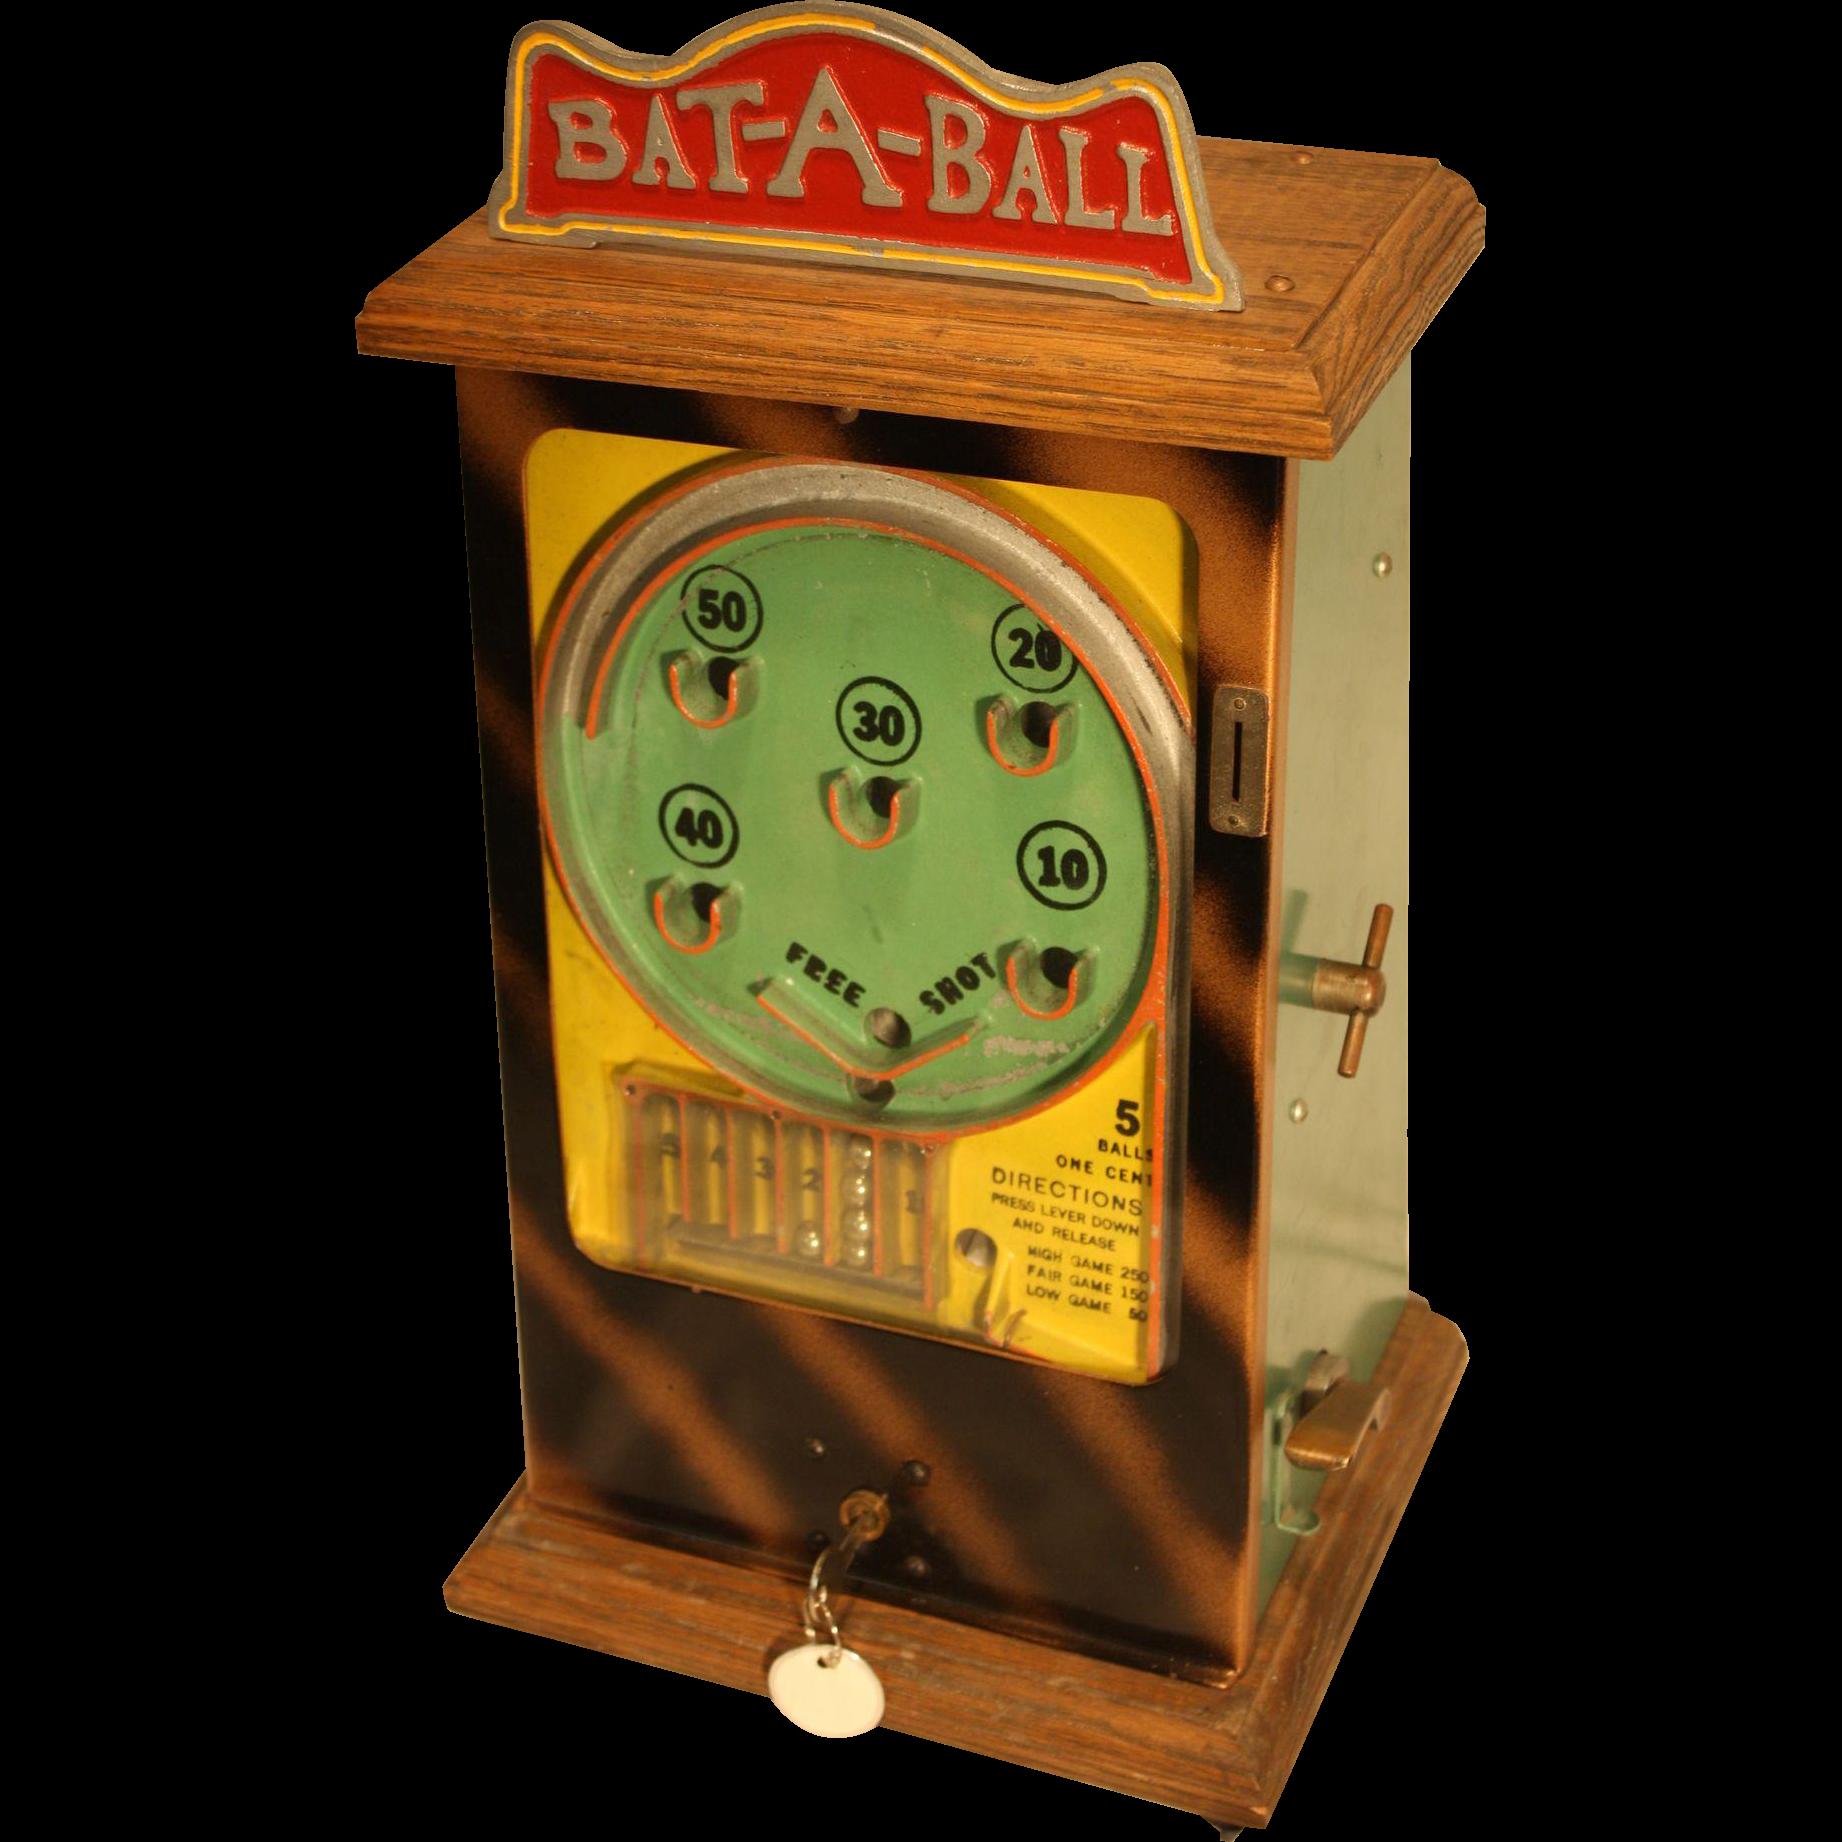 Peo Bat-A-Ball Counter-top Flip Ball Trade Stimulator 1930's